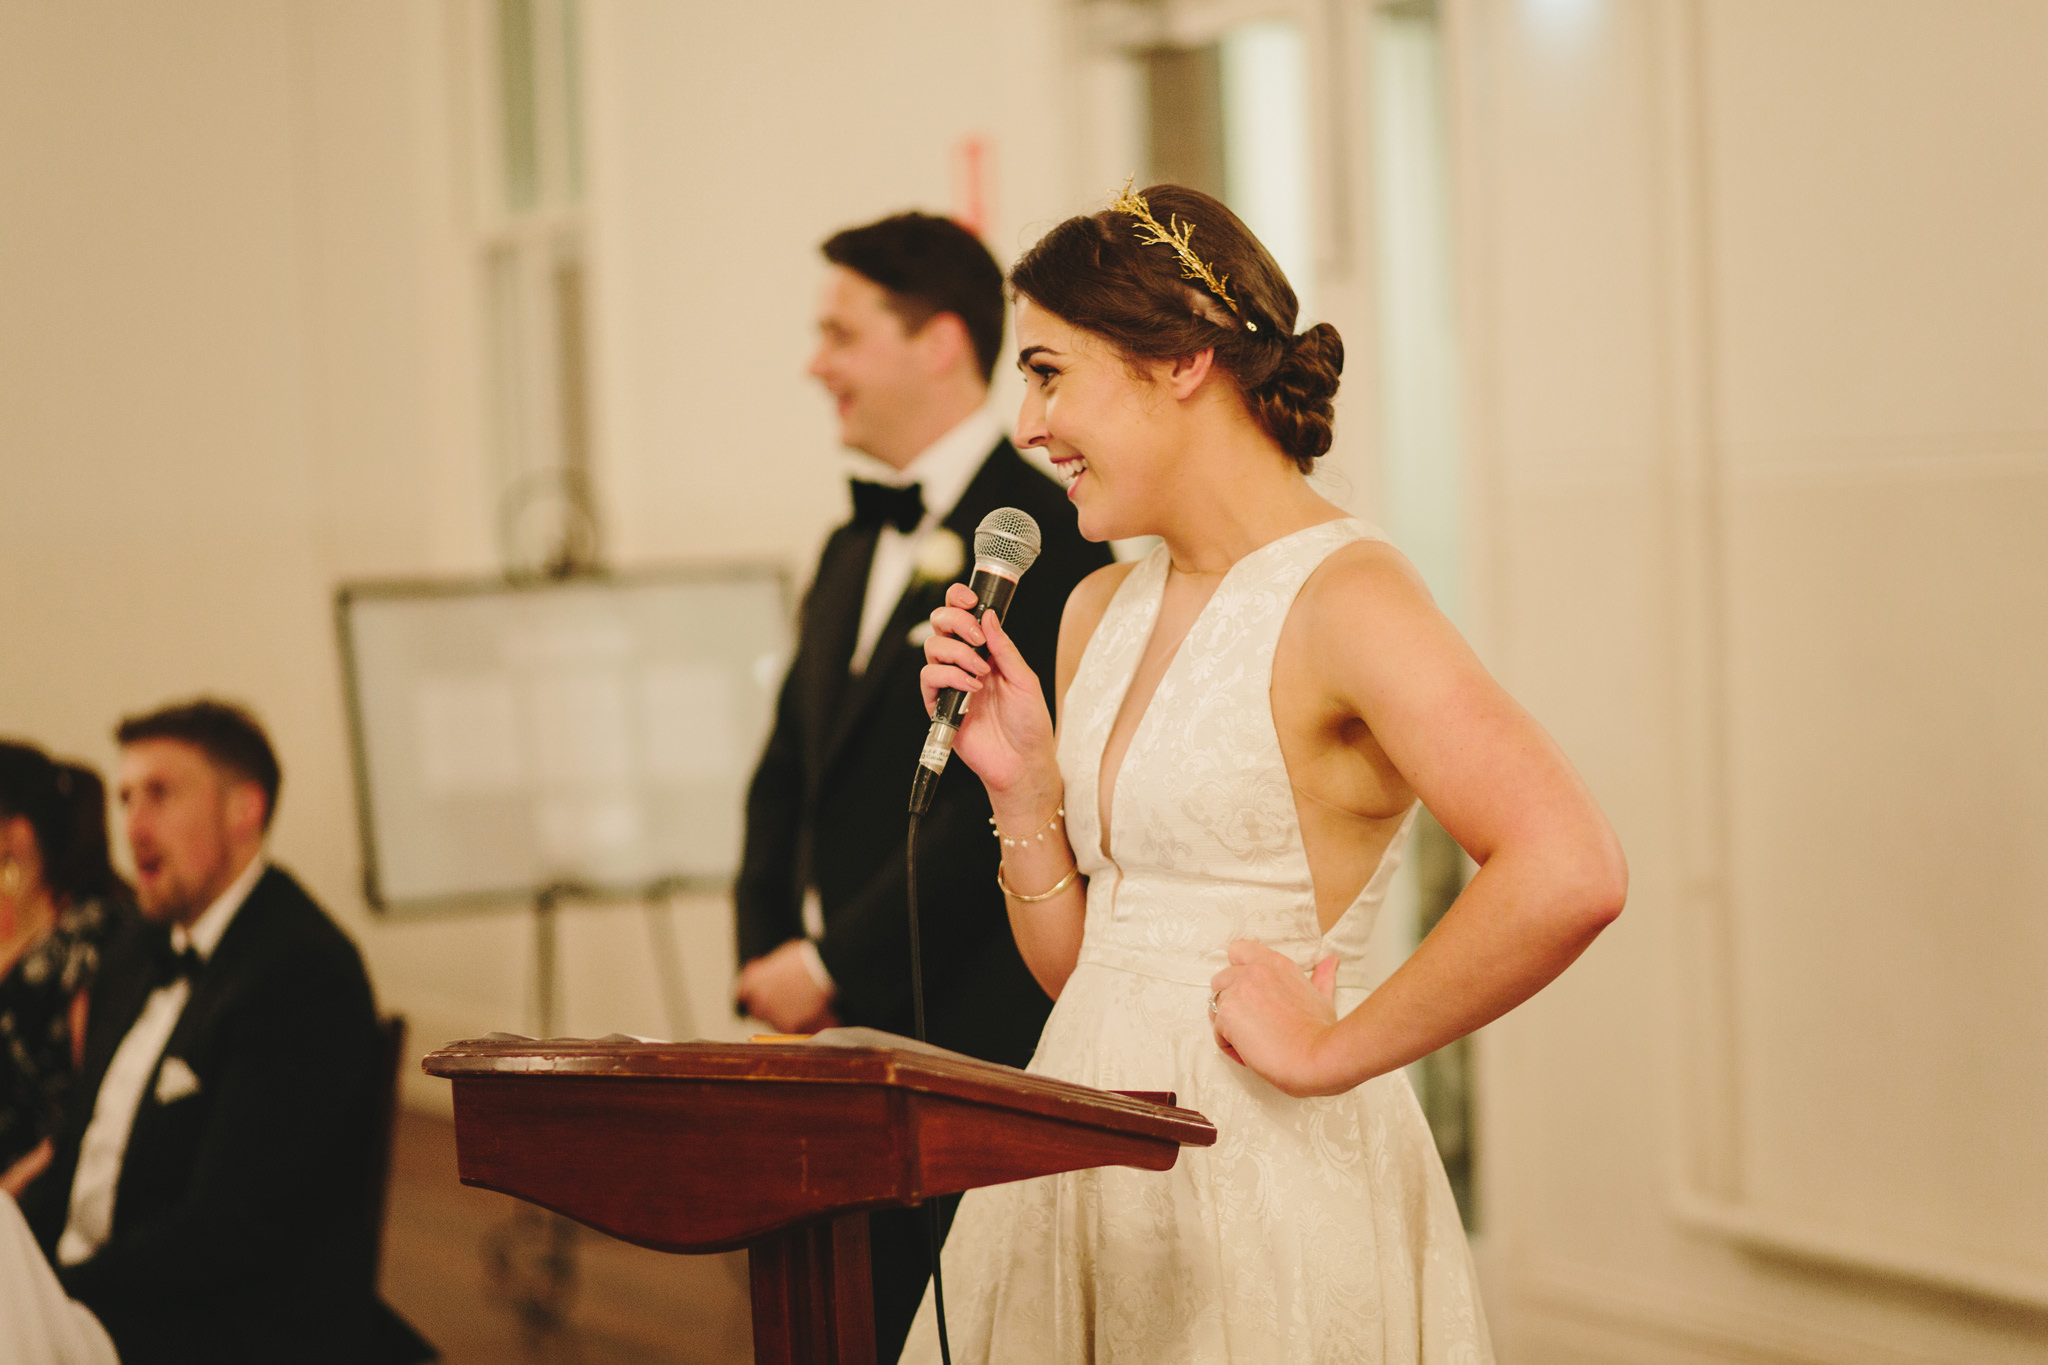 Abbotsford_Convent_Wedding_Peter_Anna124.JPG